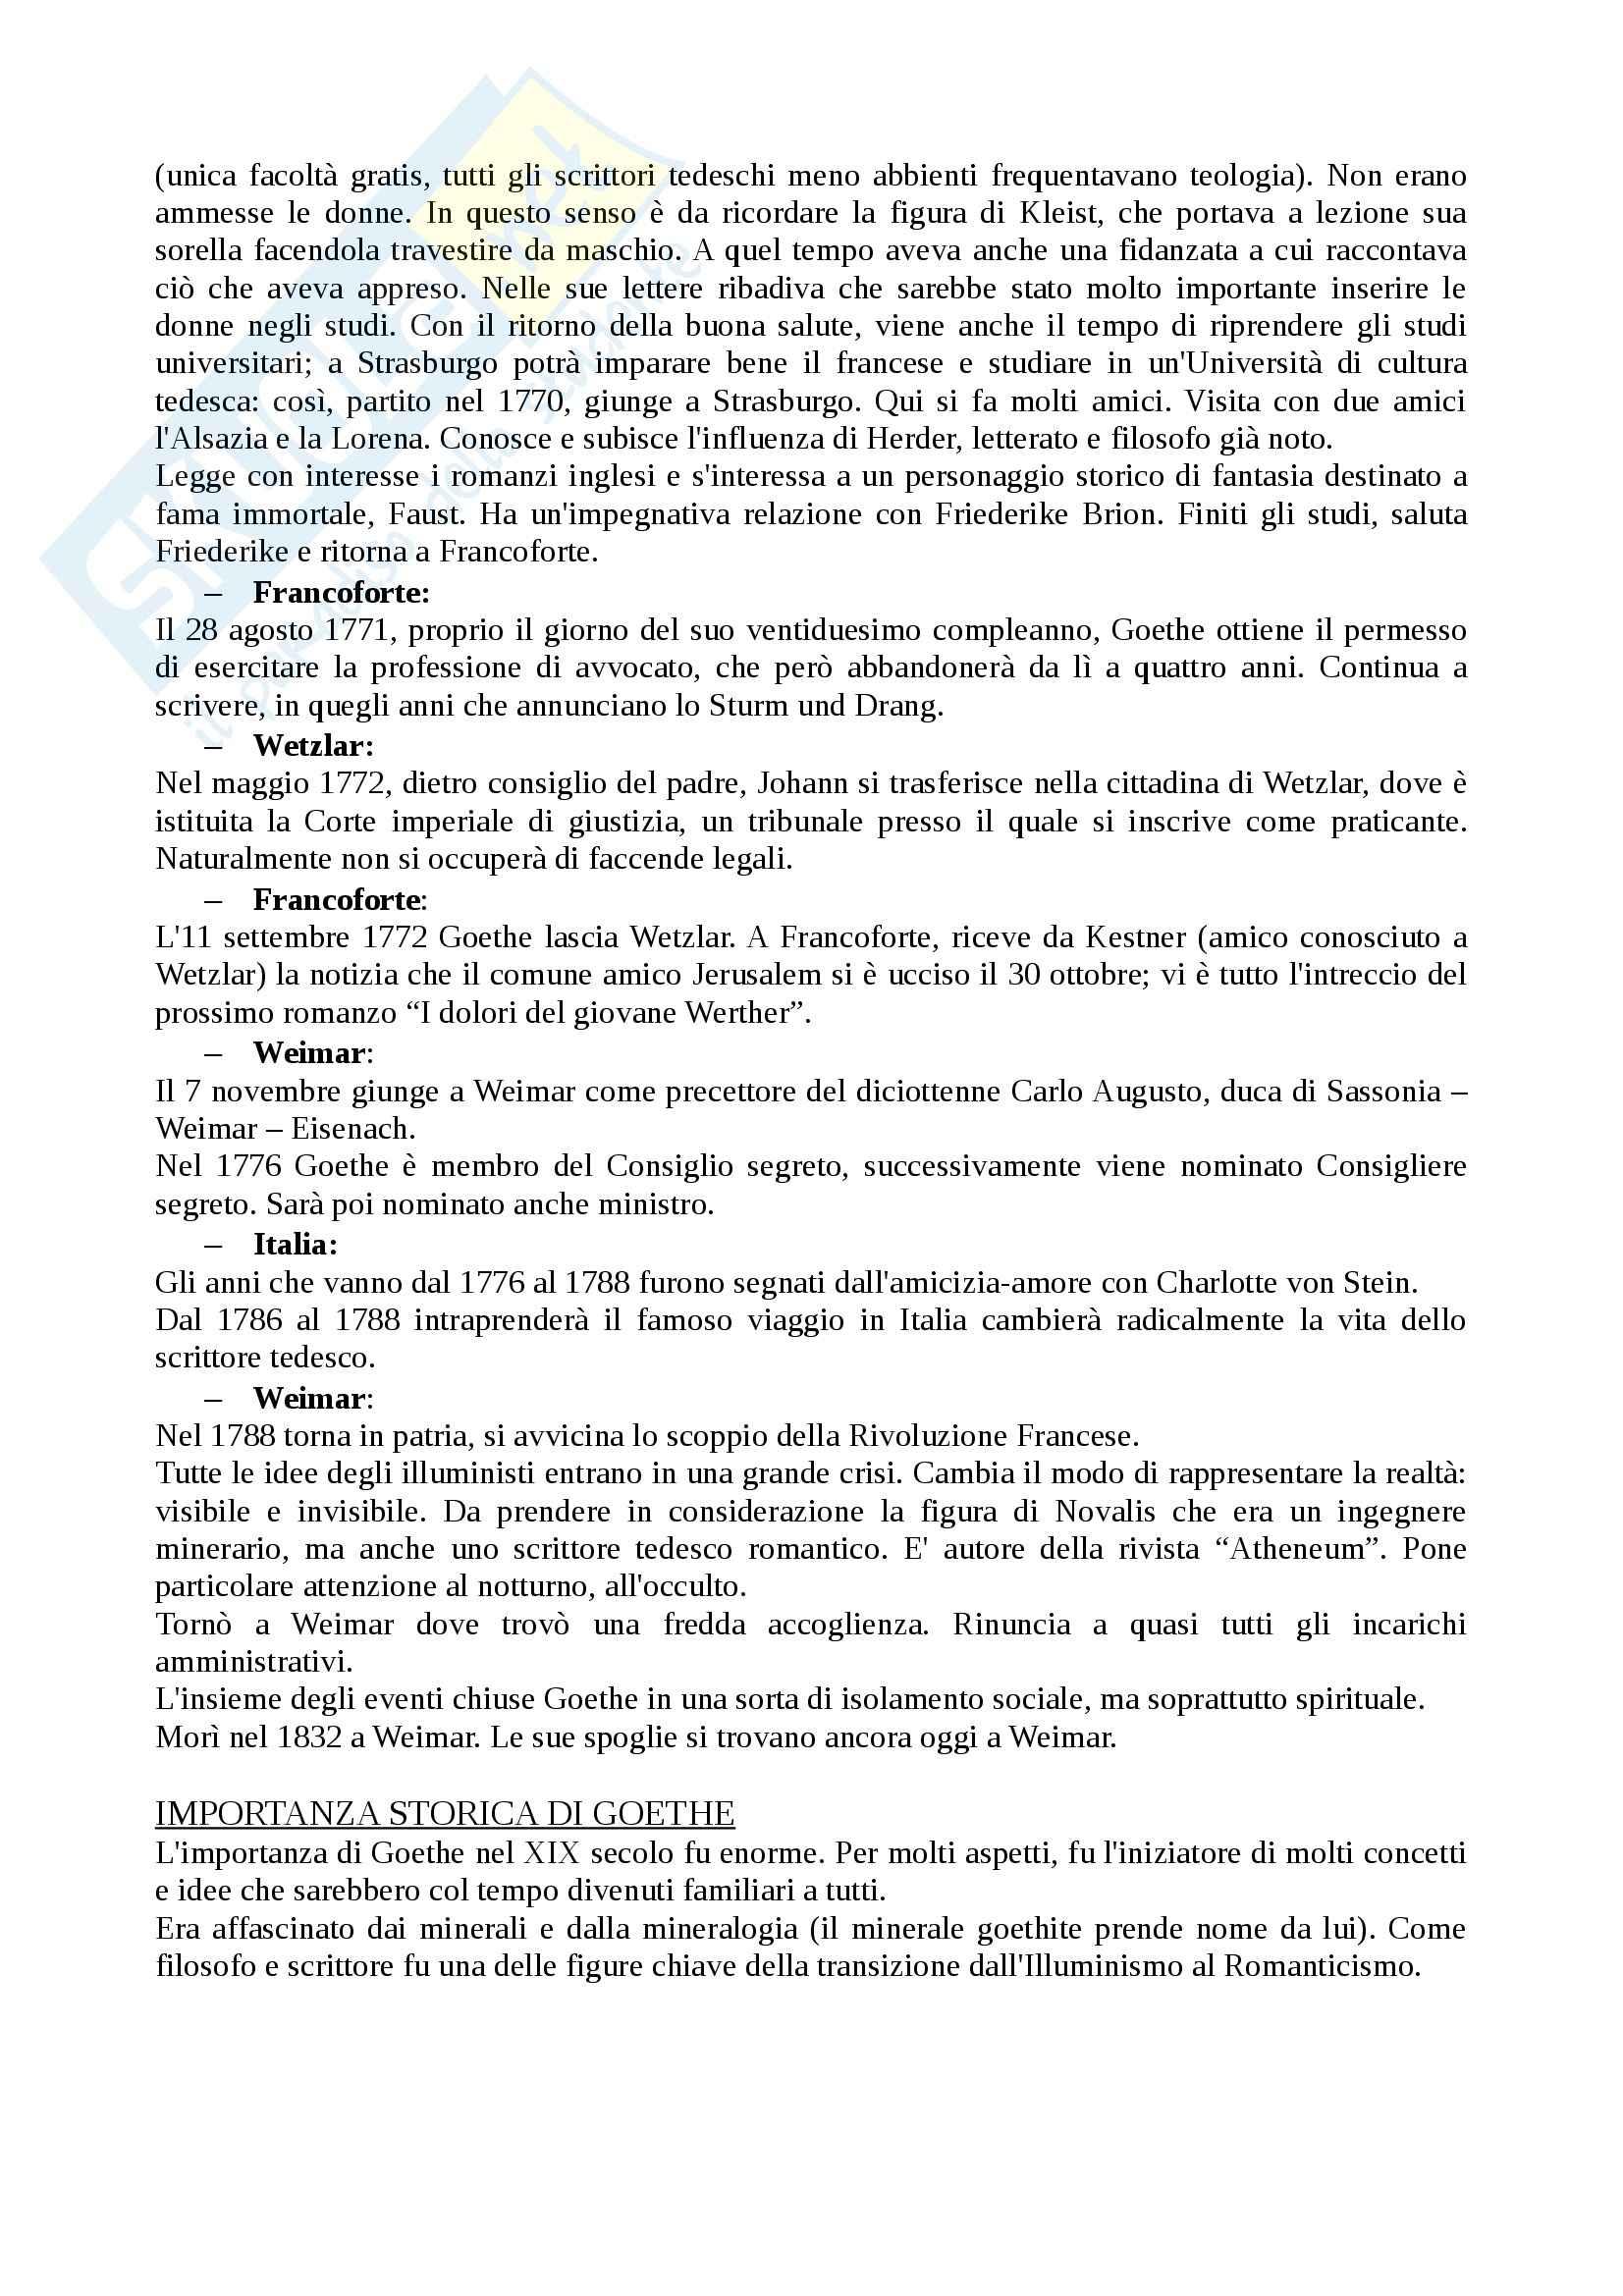 Letteratura tedesca - Goethe Pag. 2